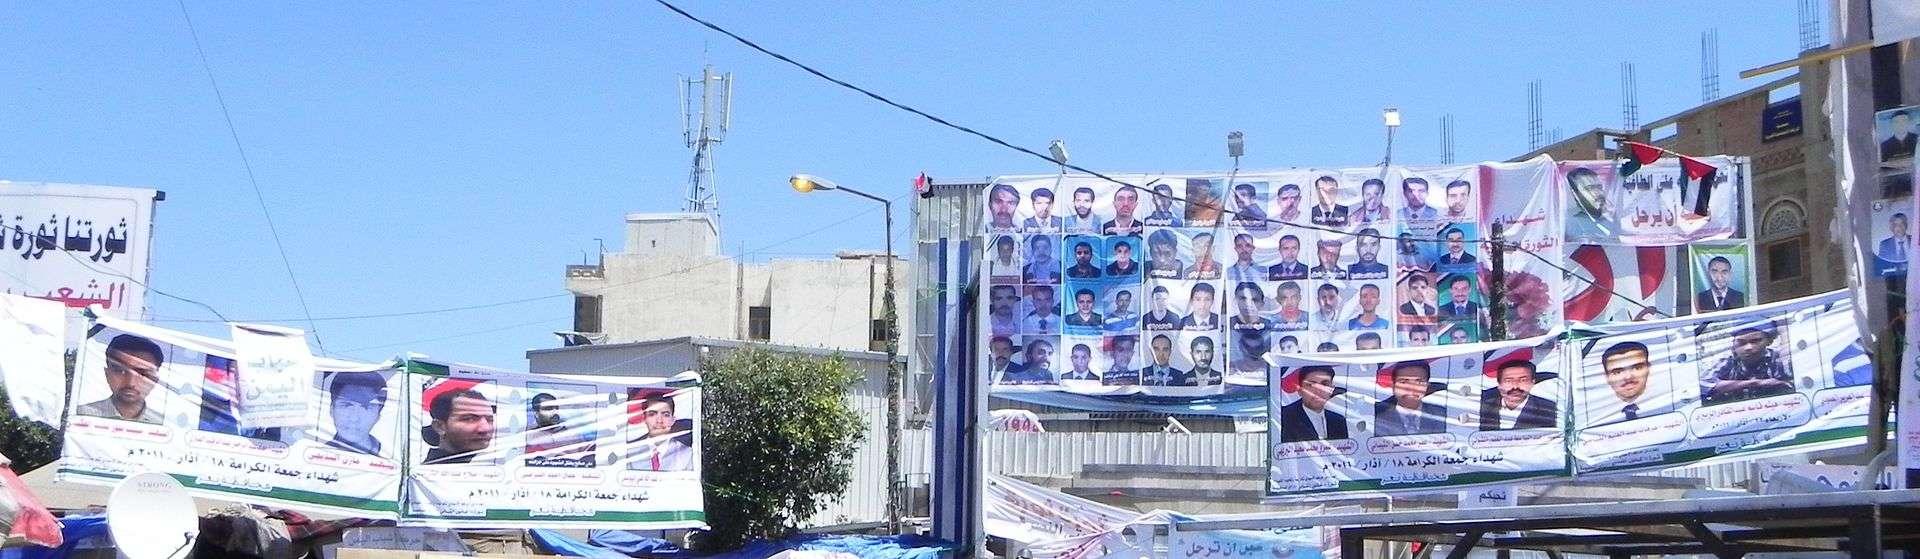 بالصور : ثورة 11 فبراير 2011 بين مؤيد وناقد 2